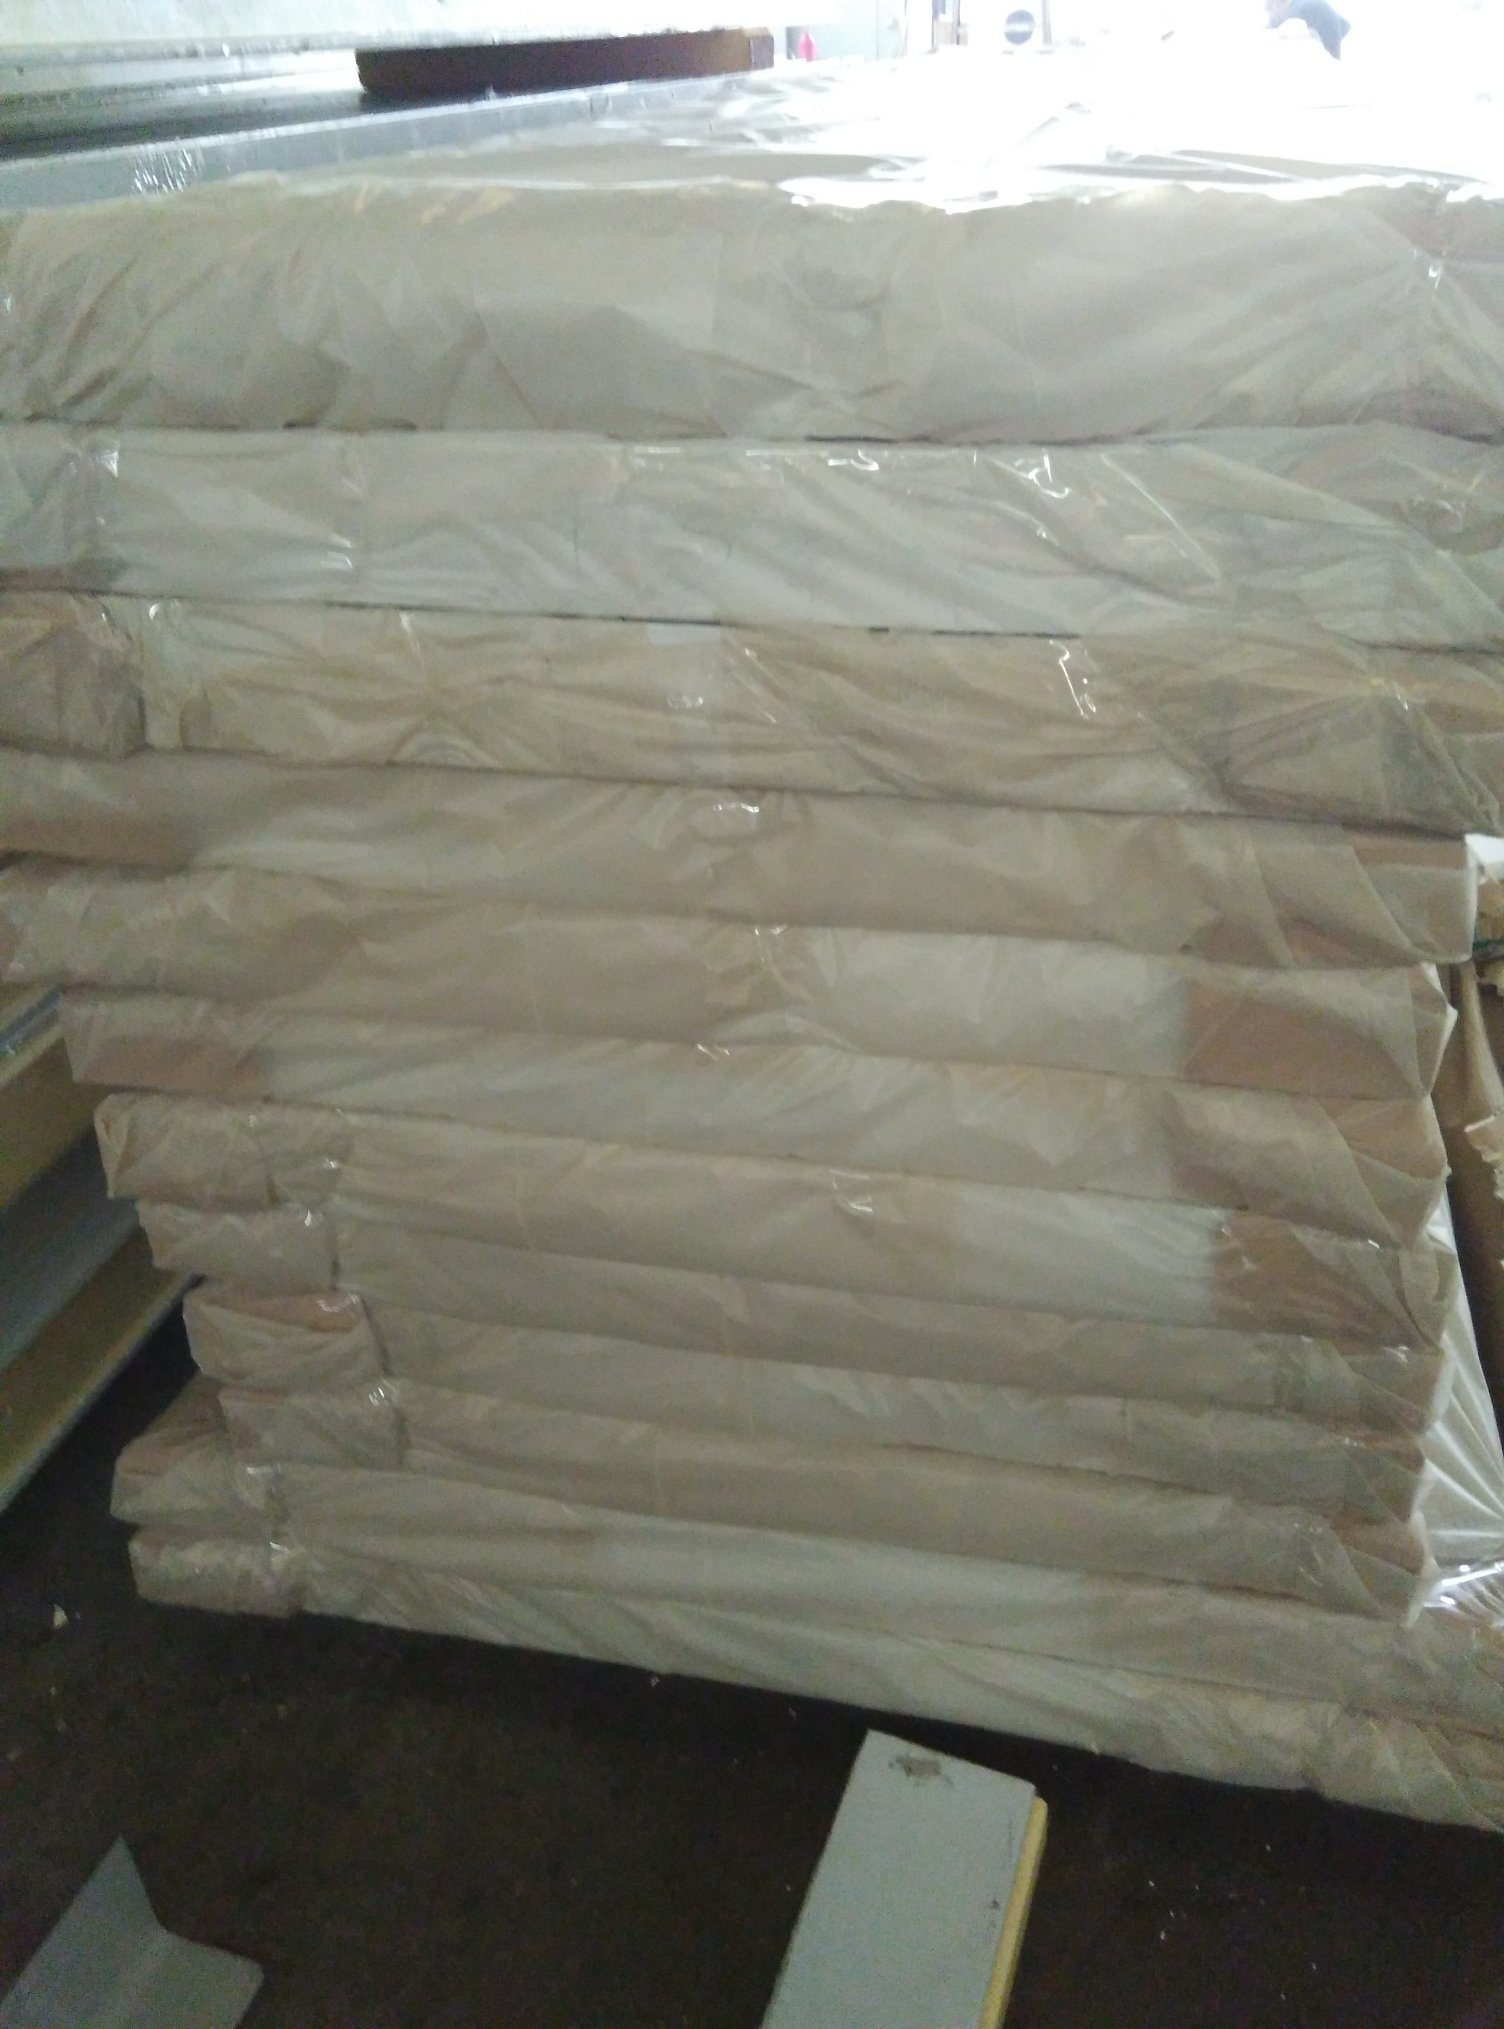 200mm Thickness Polyurethane Sandwich Panel for Blast Deep Freezer